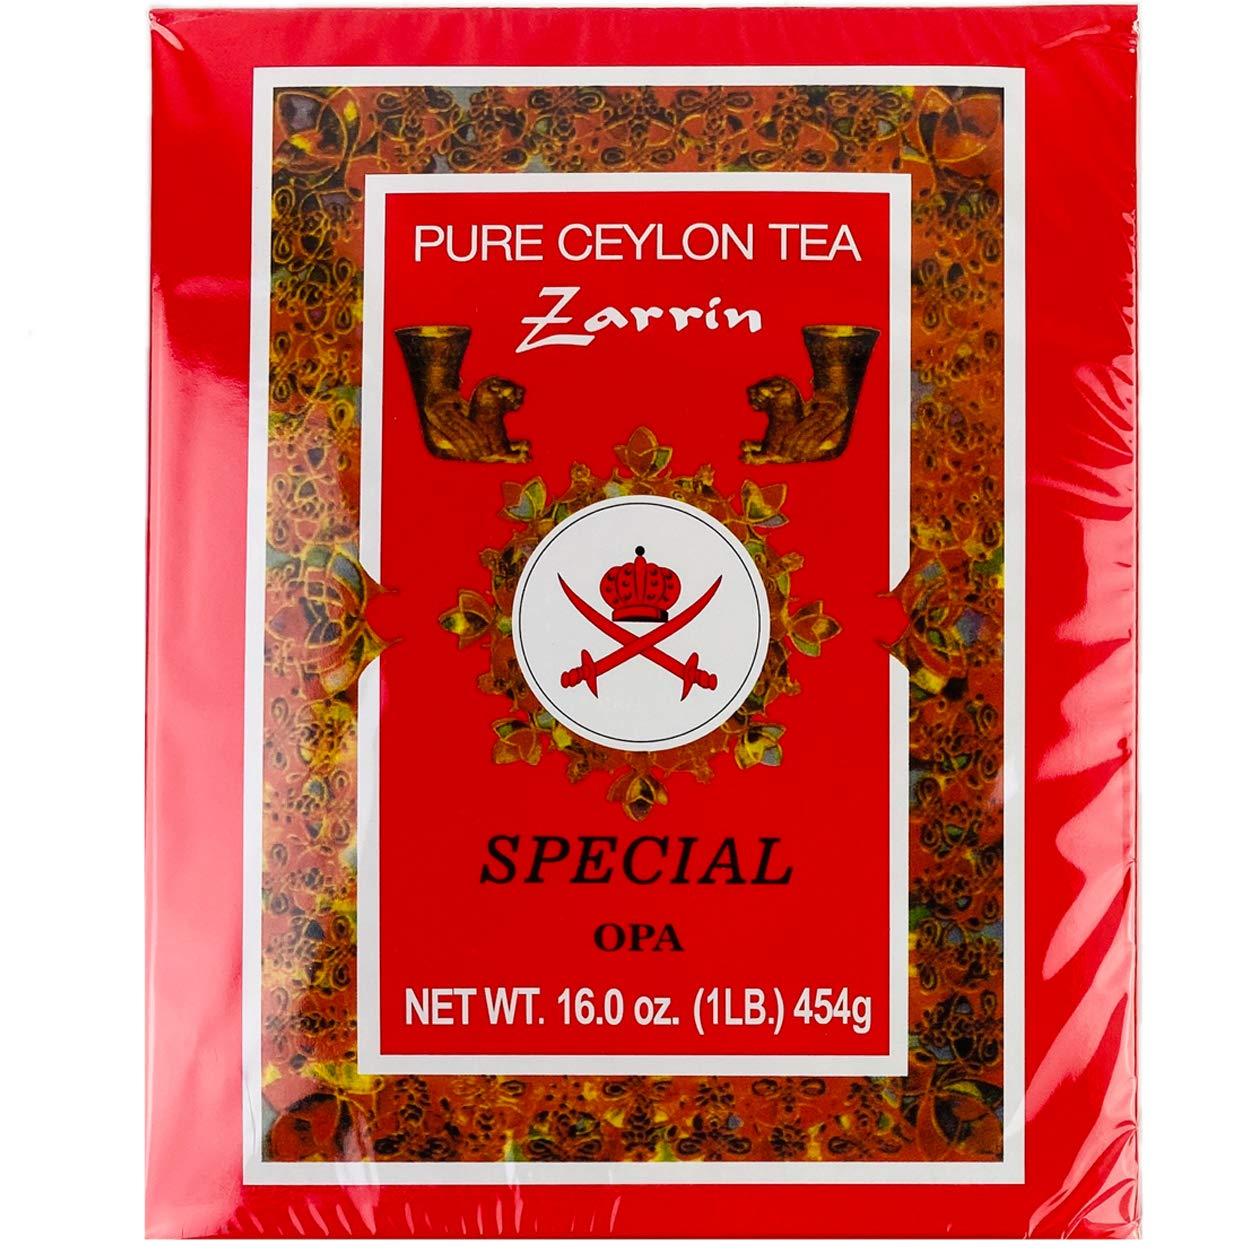 Zarrin - Pure Ceylon Tea OPA, Orange Pekoe A, 1LB (454g)